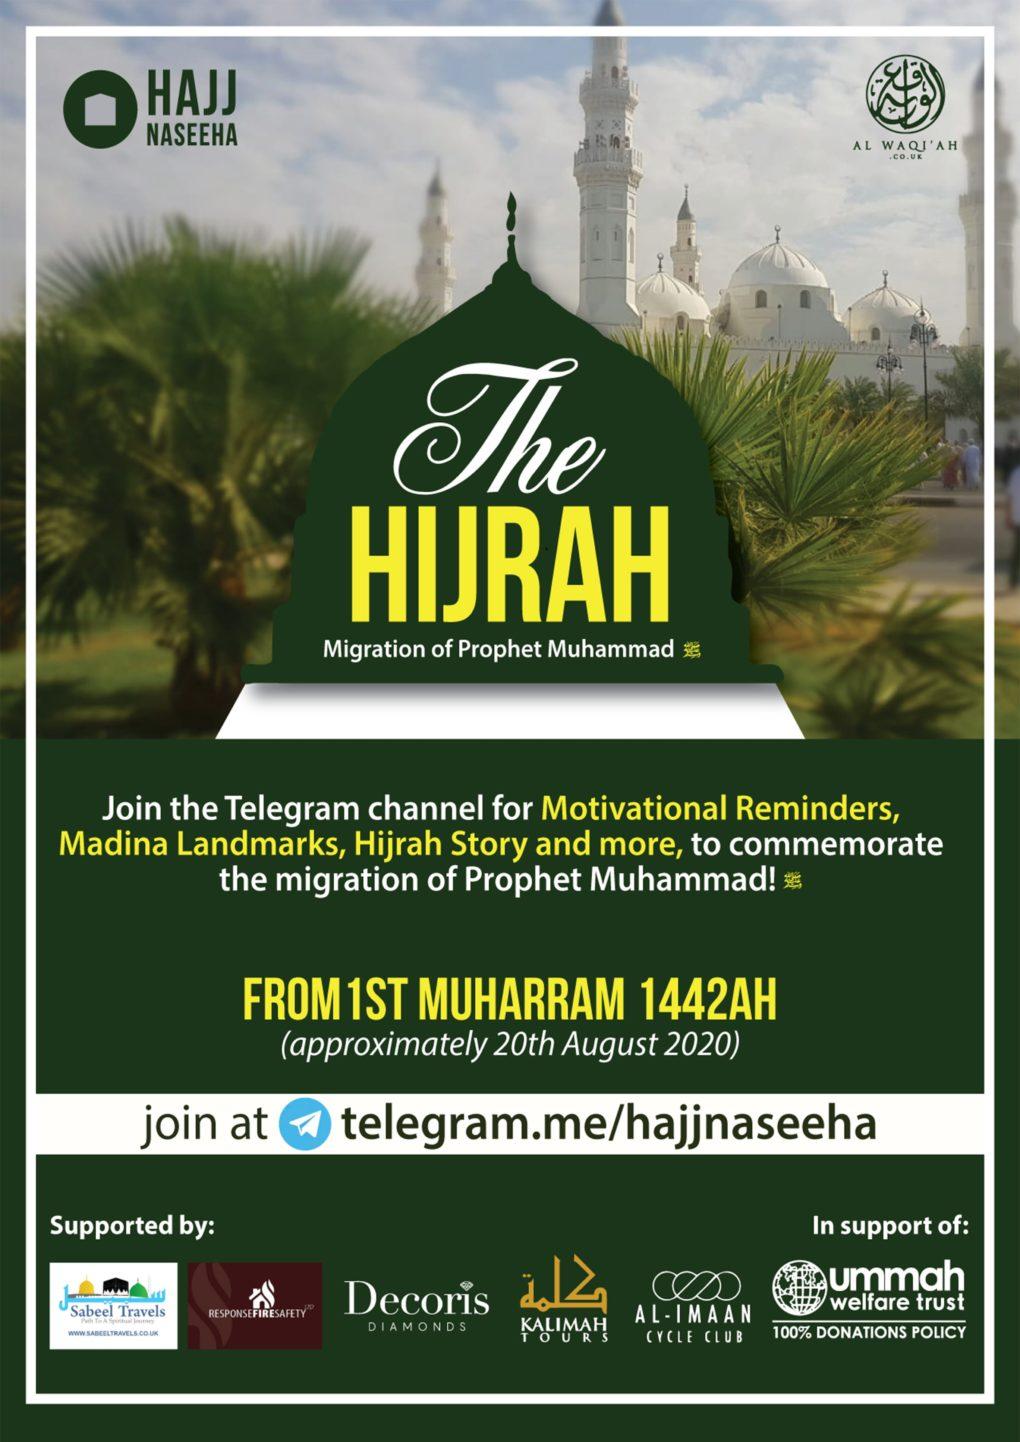 THE HIJRAH STORY | Ustadh Abdul Muqeet